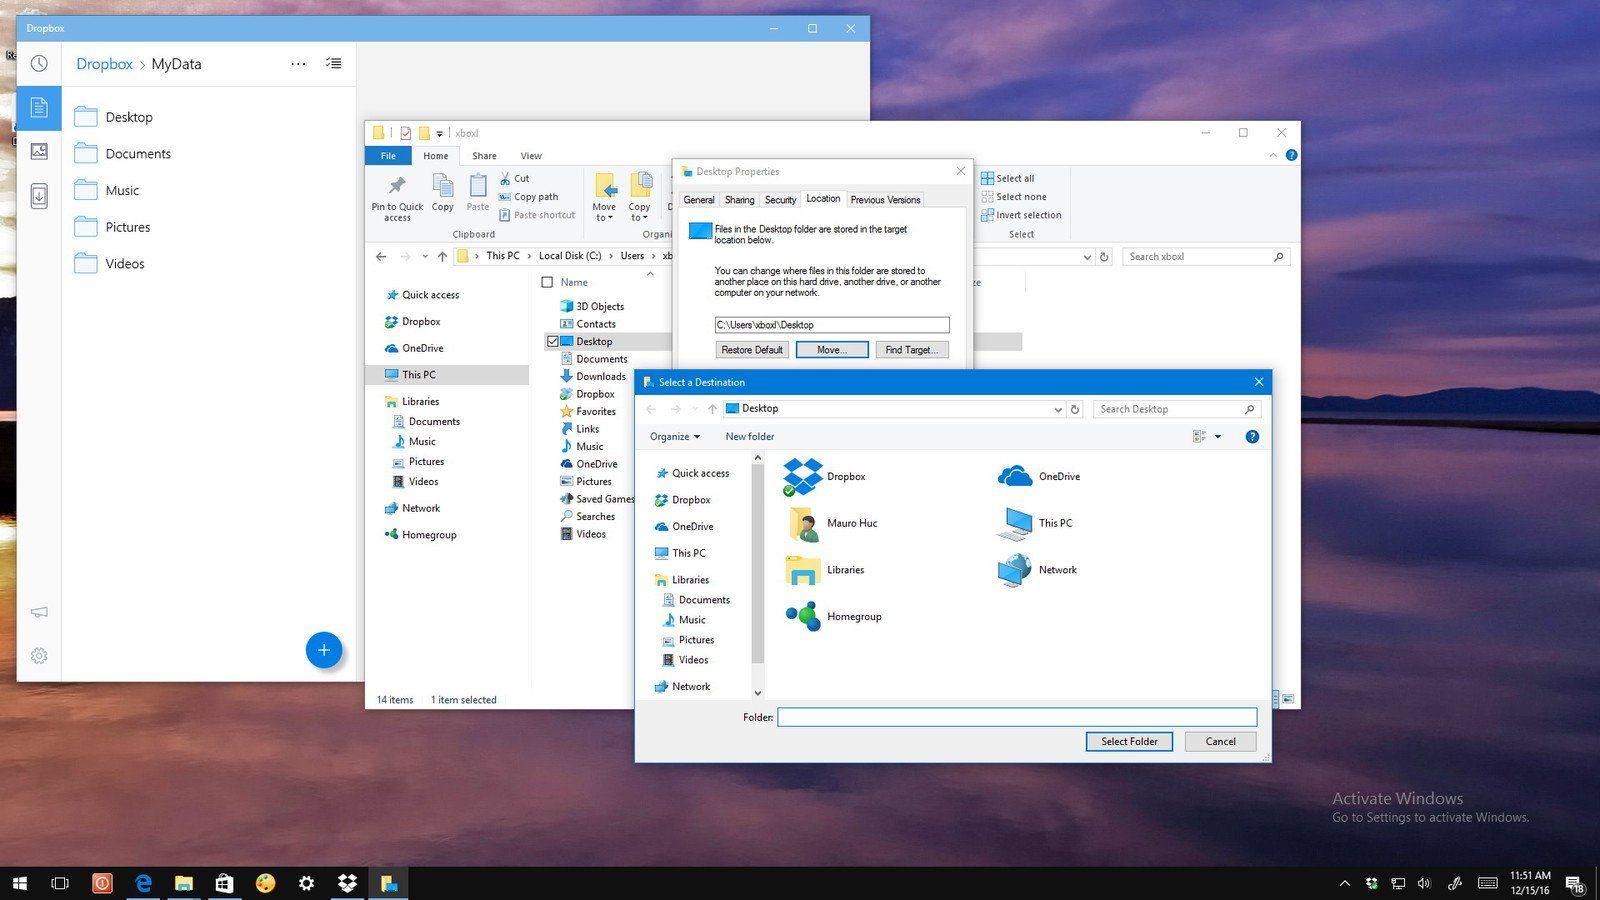 Sync Your Windows 10 Desktop And Documents To Dropbox Windows 10 Windows Dropbox